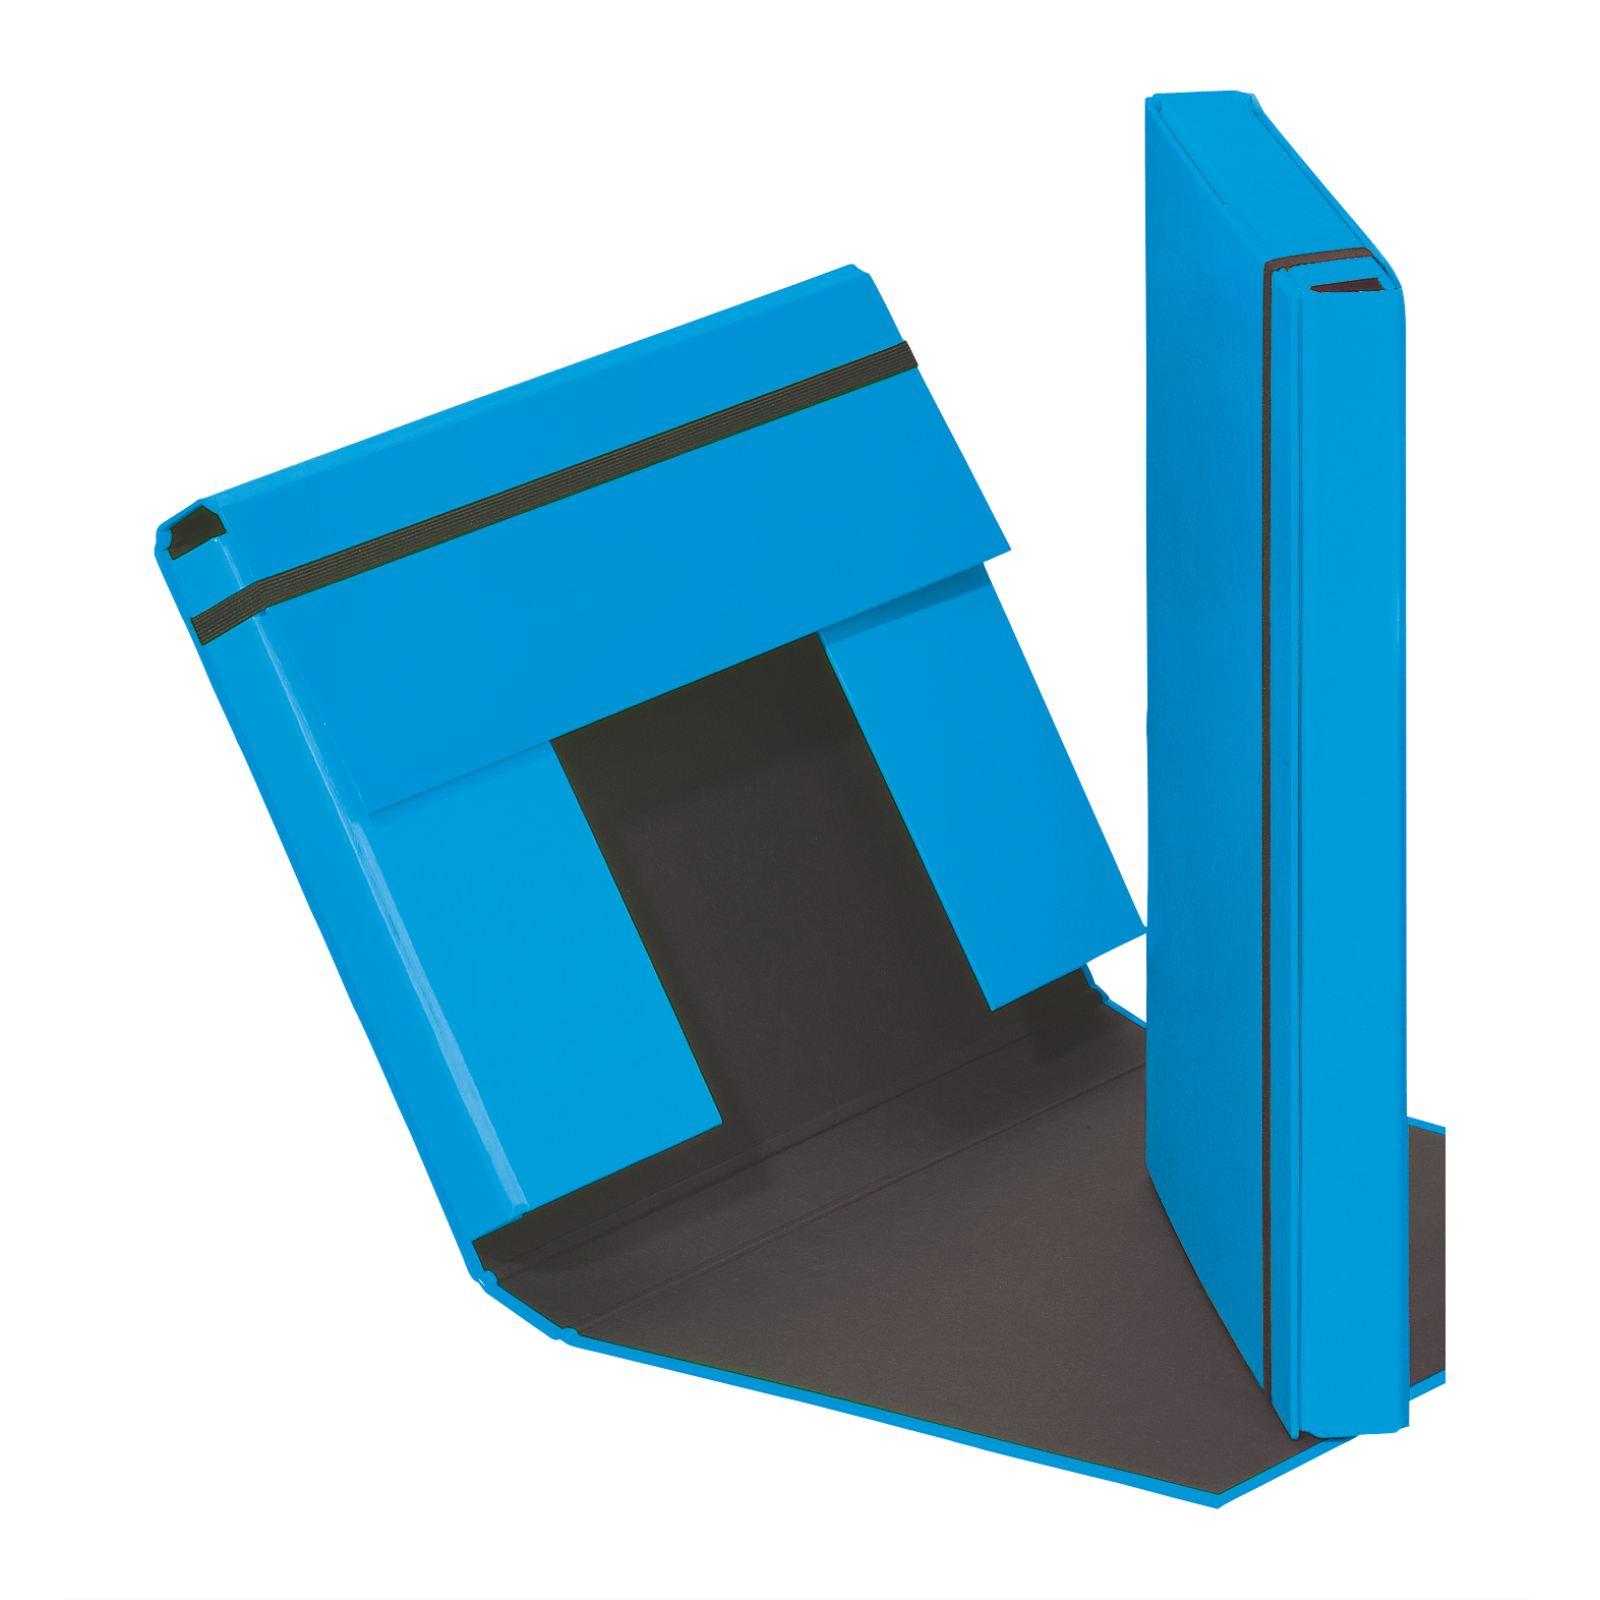 Pagna 21308-20 - Blau - Pappe - A4 - 245 mm - 335 mm - 40 mm